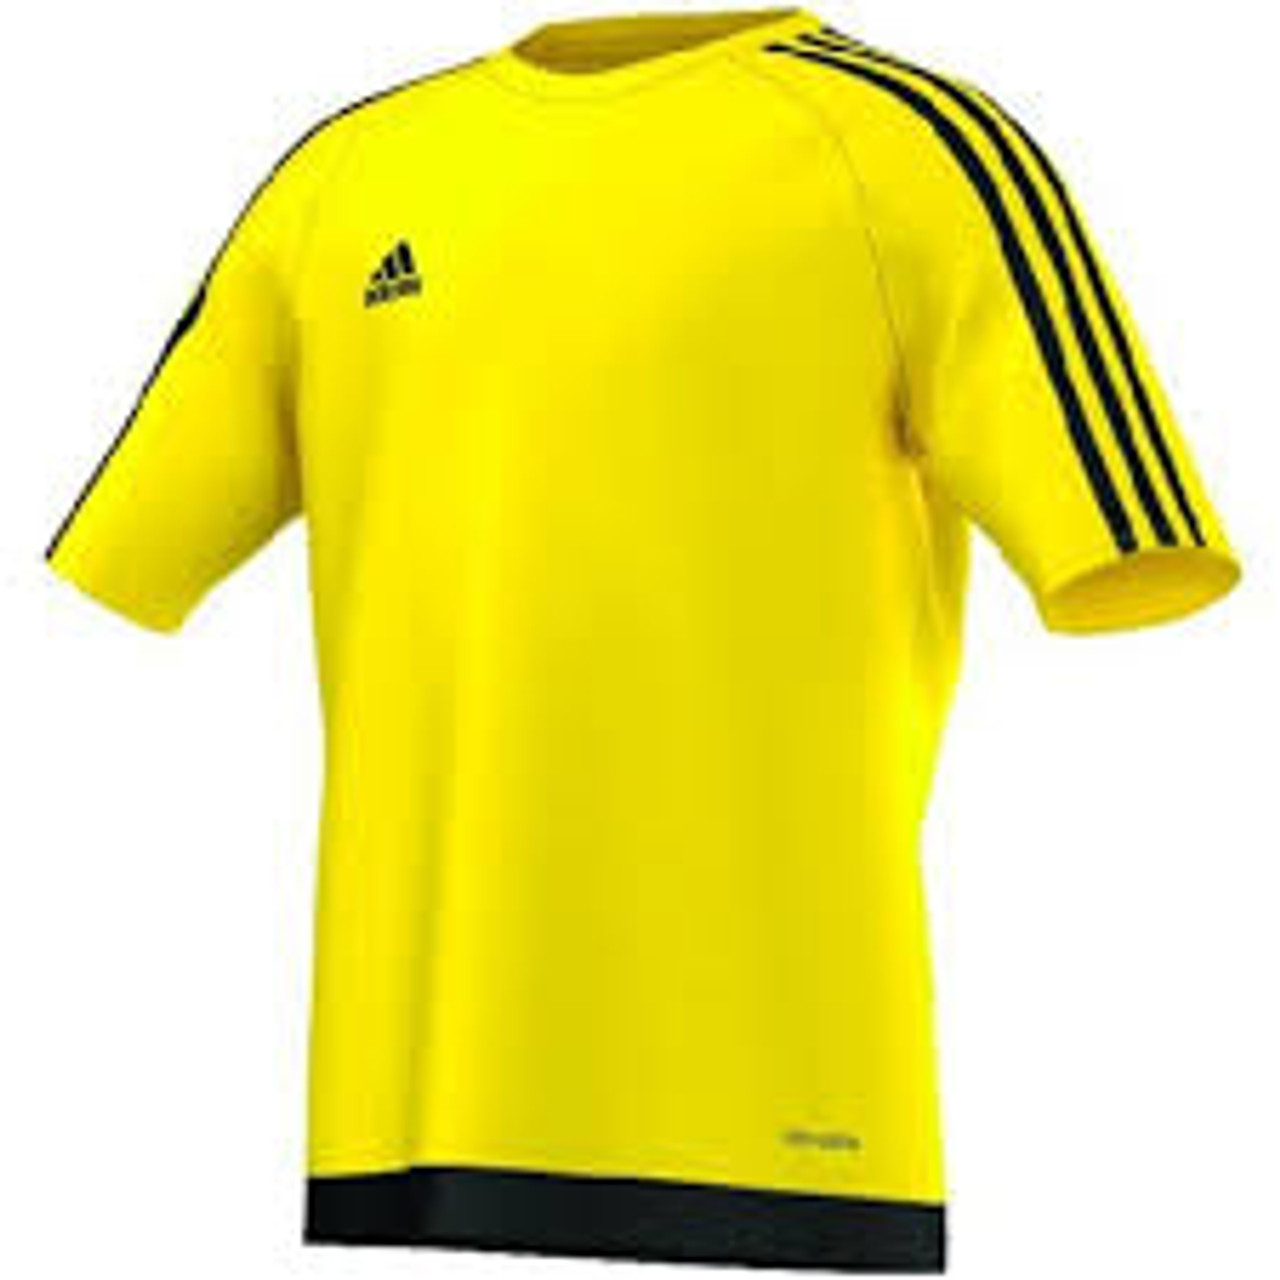 ADIDAS ESTRO 15 YOUTH JERSEY YELLOW soccer team uniform